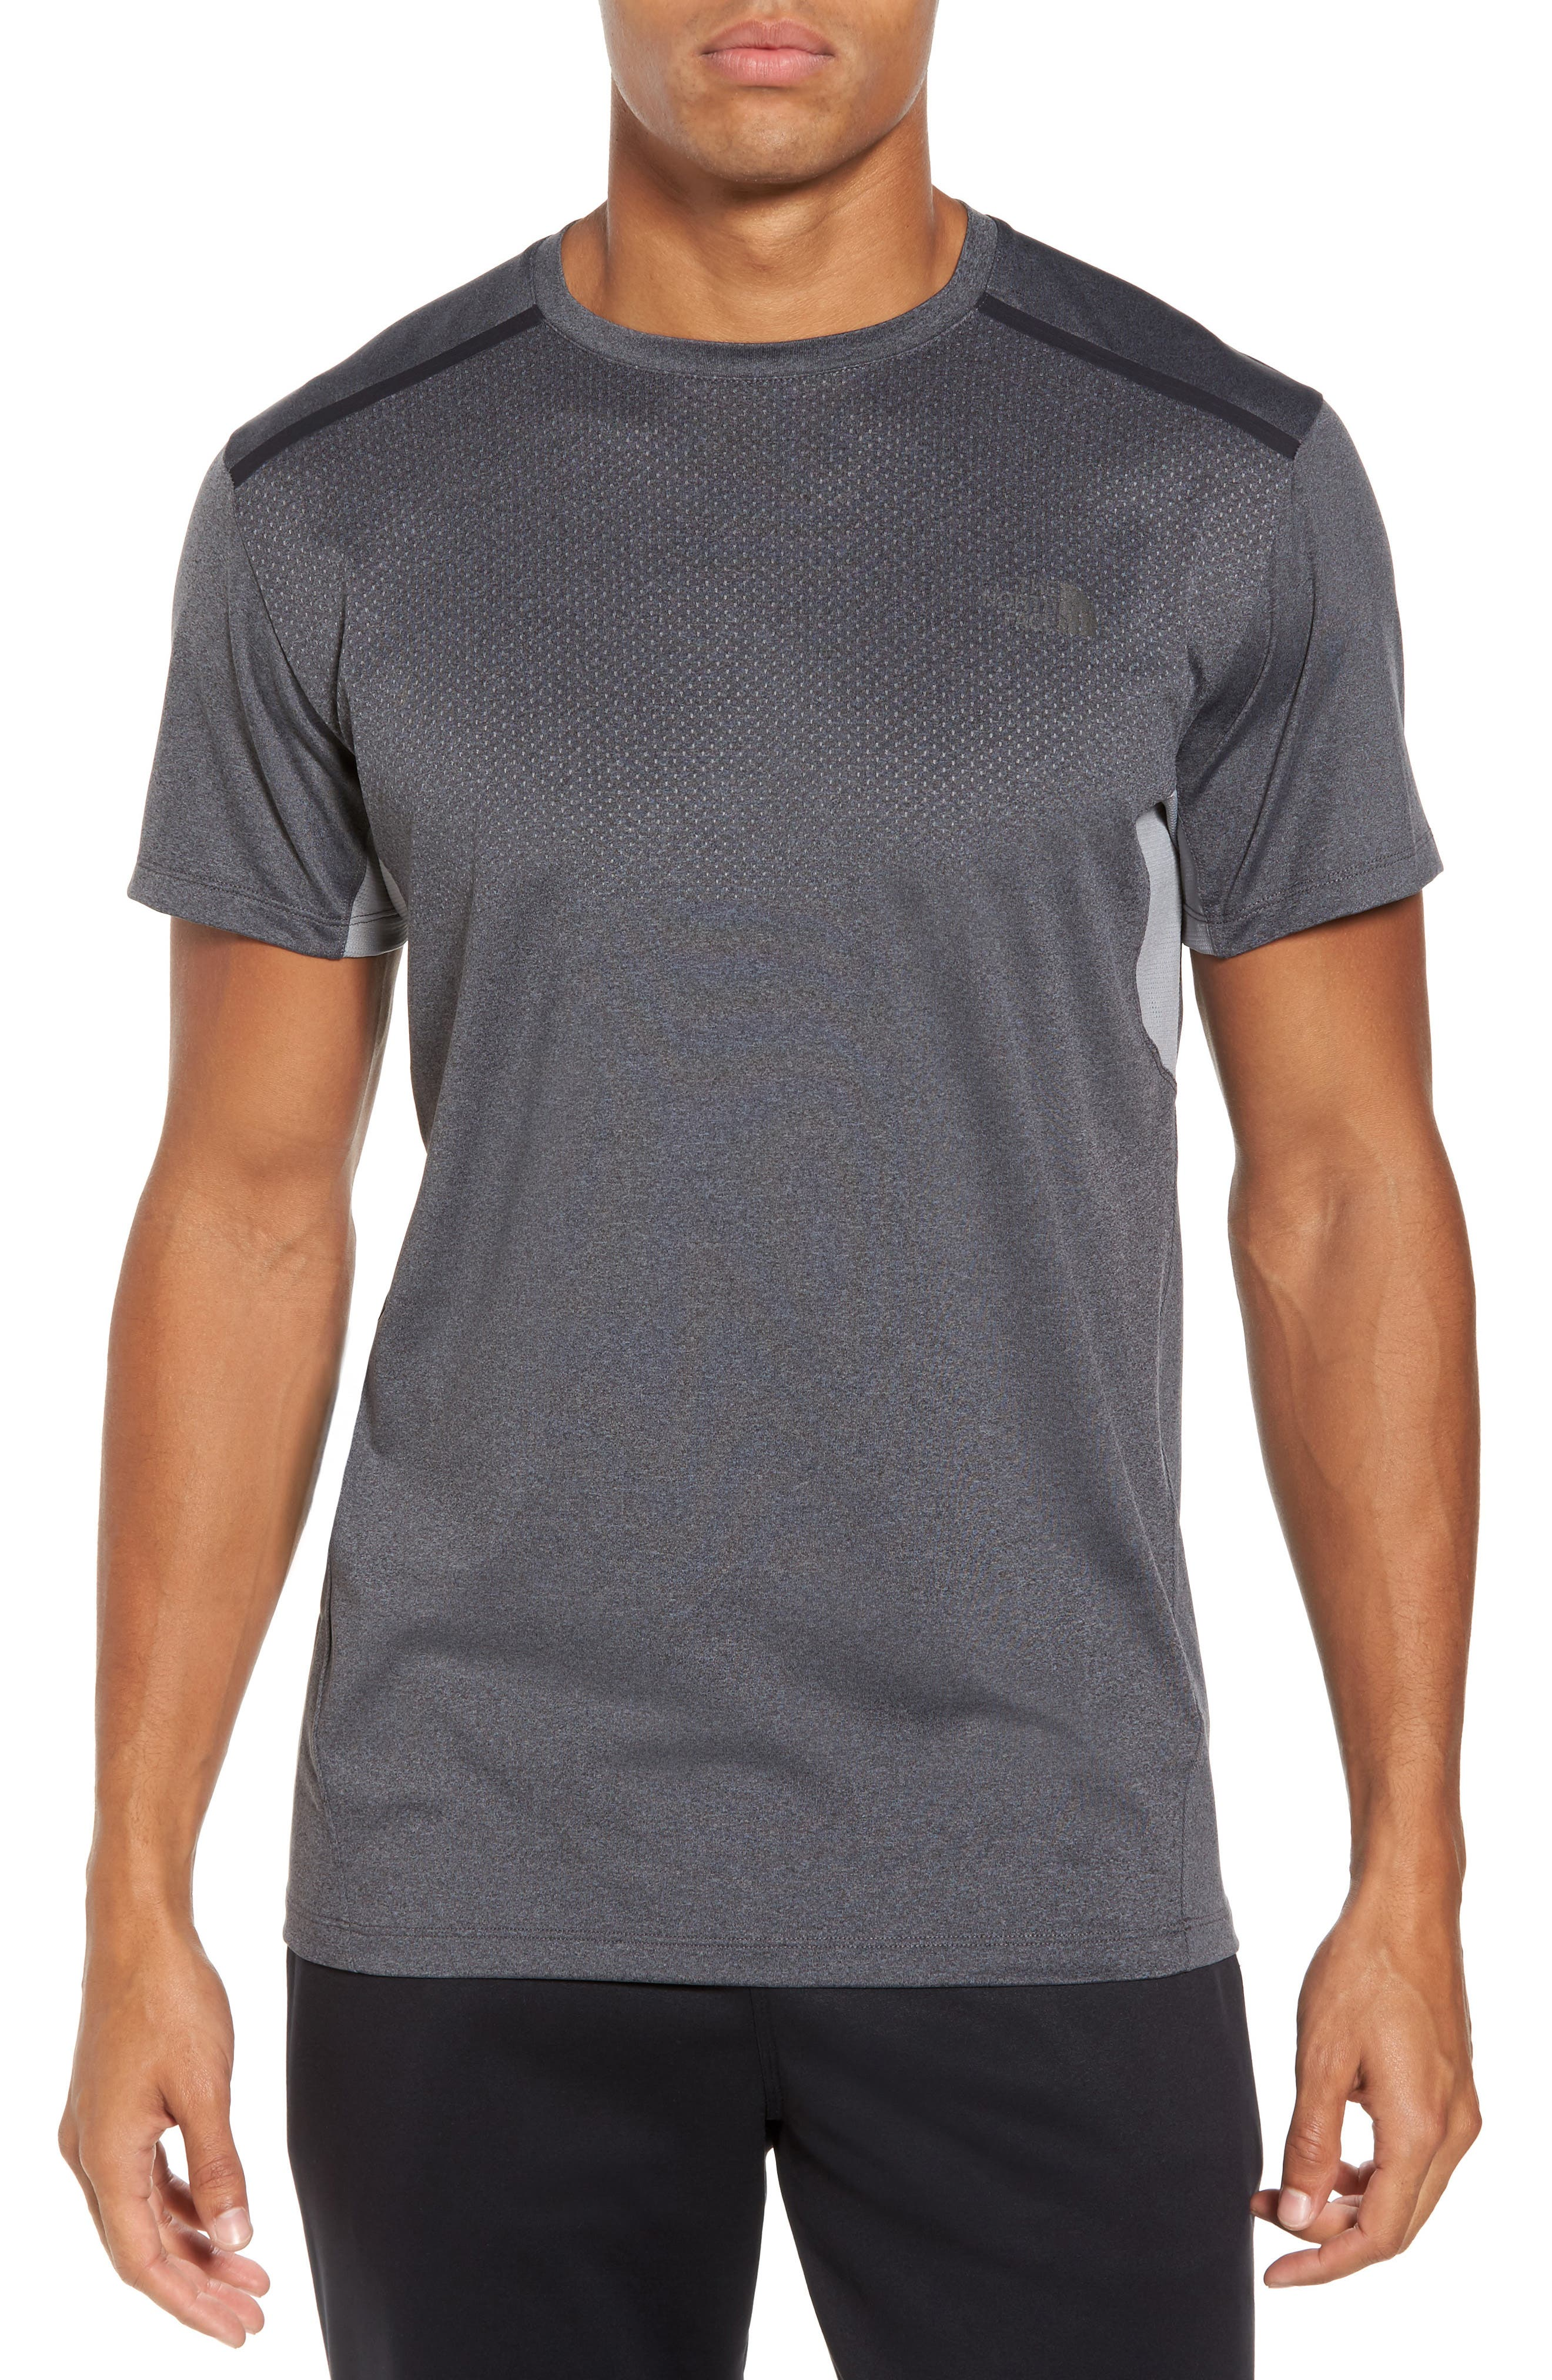 Alternate Image 1 Selected - The North Face 'Kilowatt' Performance T-Shirt